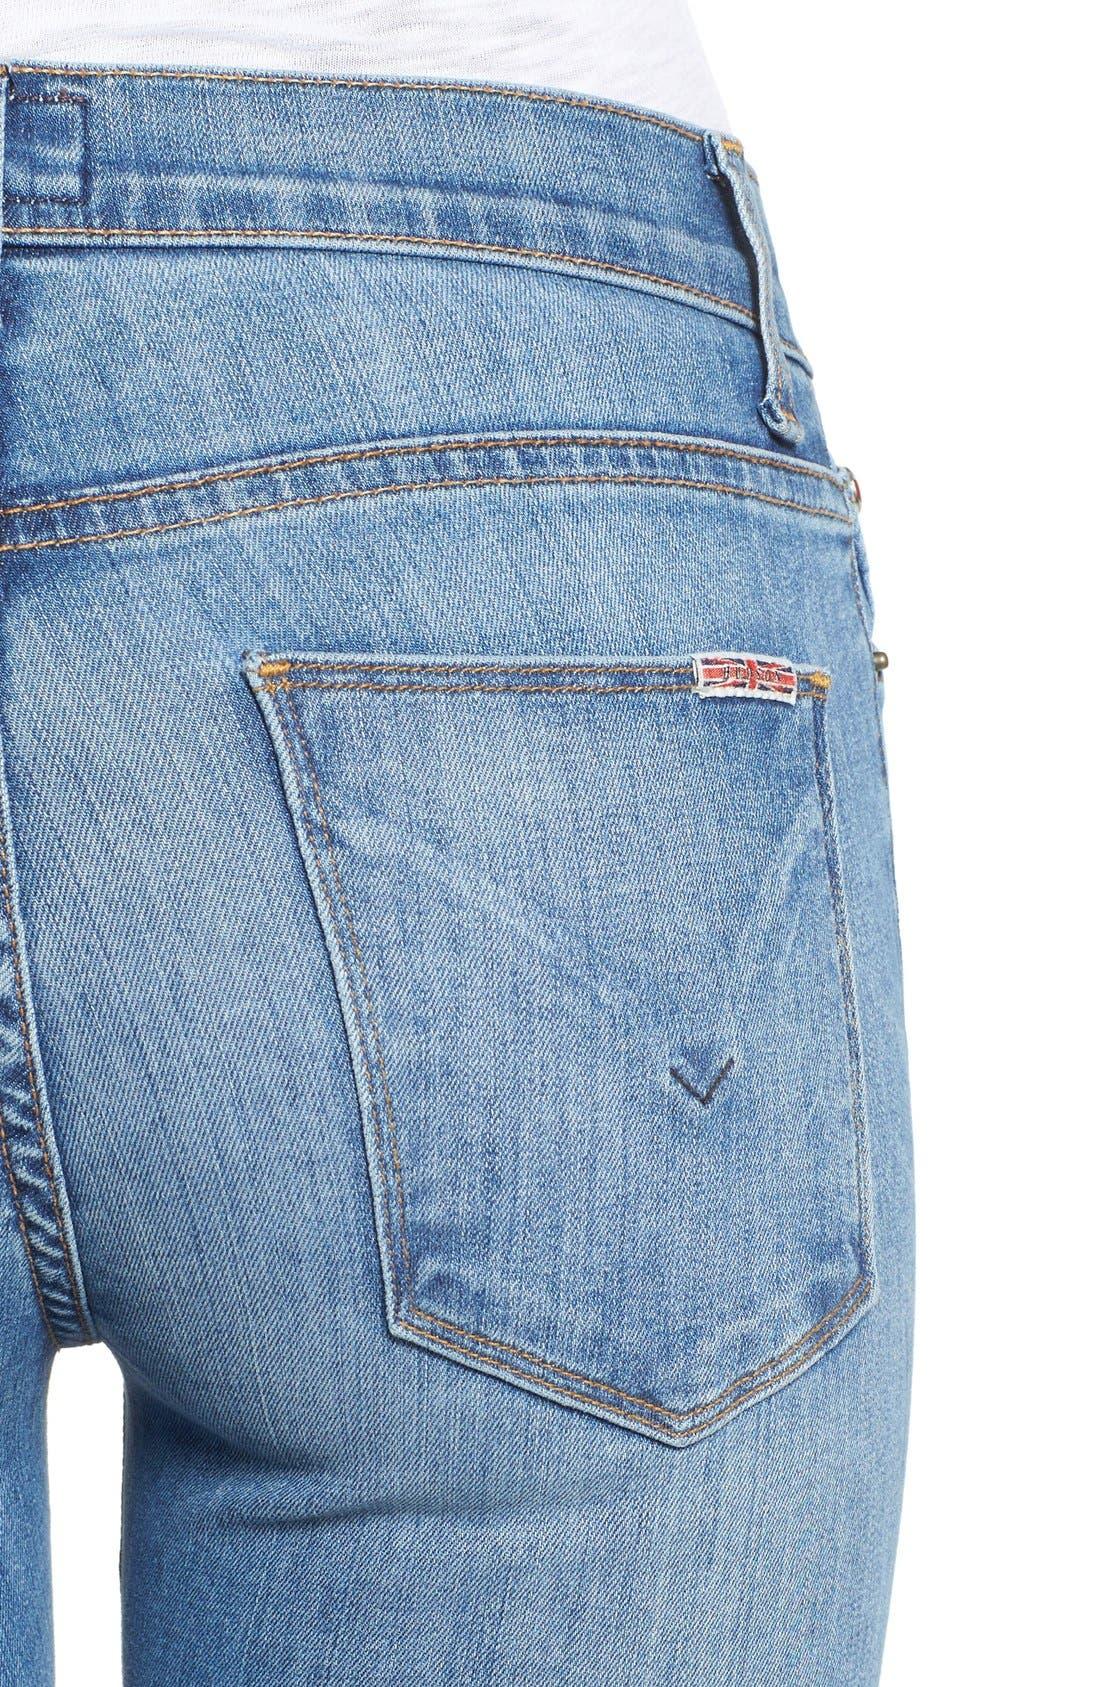 'Nico' Super Skinny Jeans,                             Alternate thumbnail 18, color,